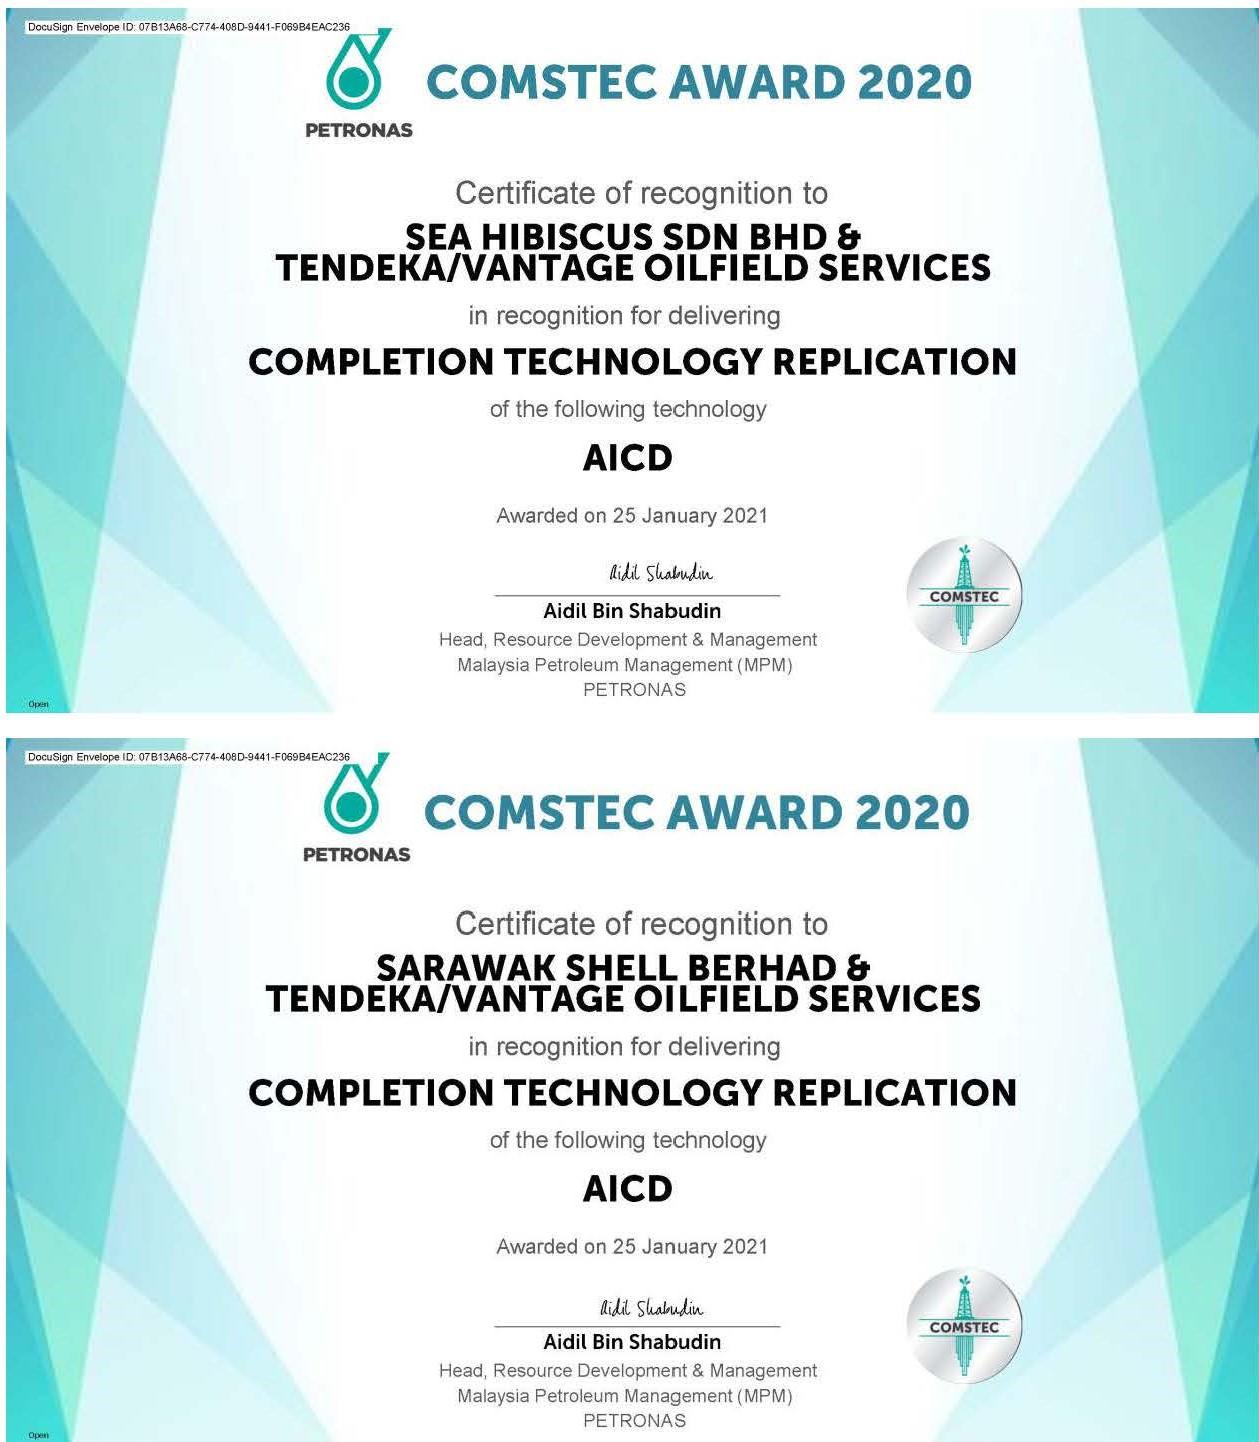 COMSTEC awards certificates